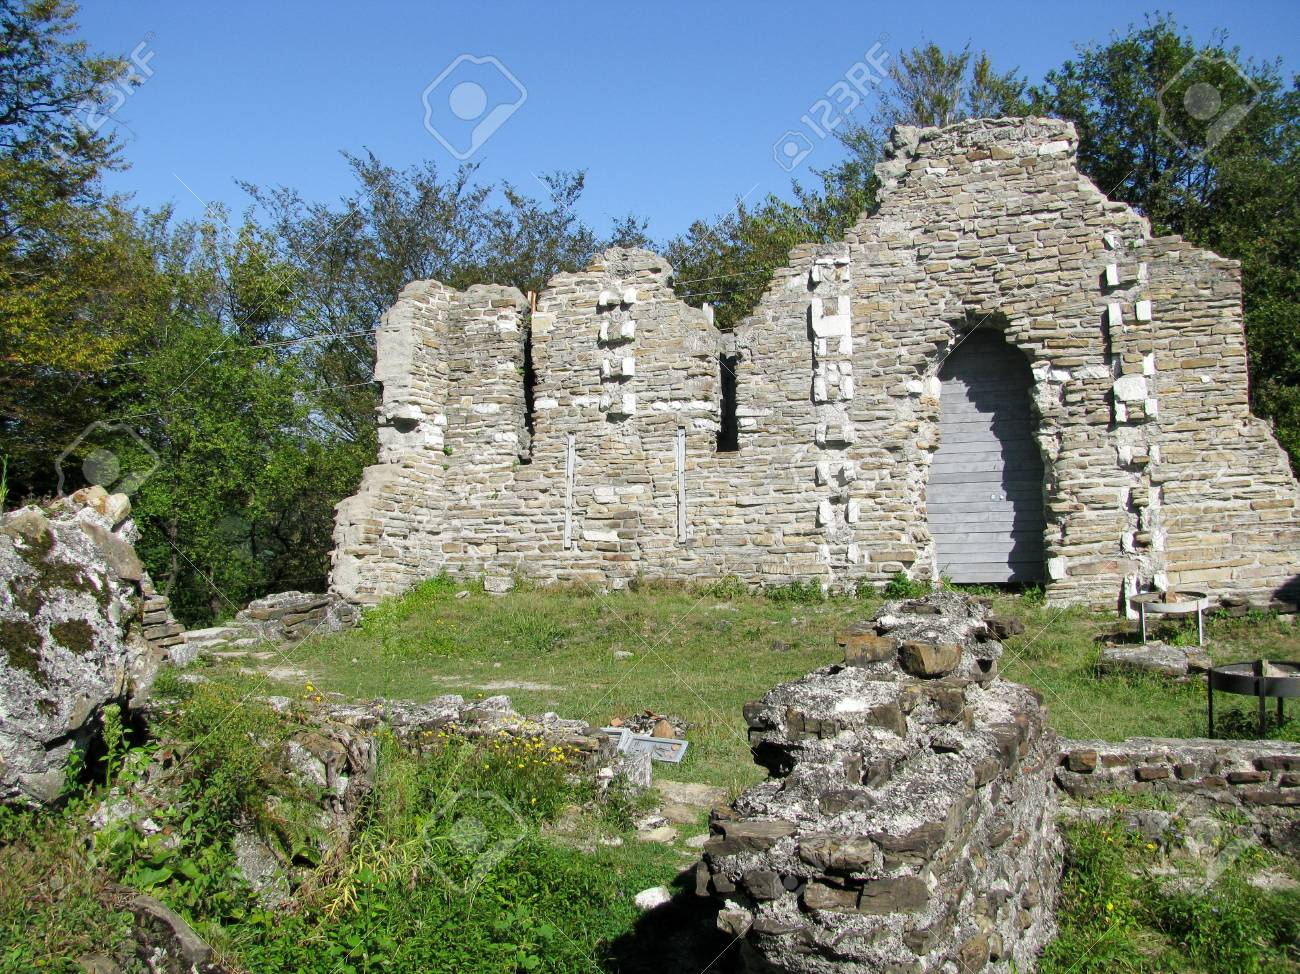 11487123-the-ruins-of-an-ancient-byzantine-church-russia-loo.jpg